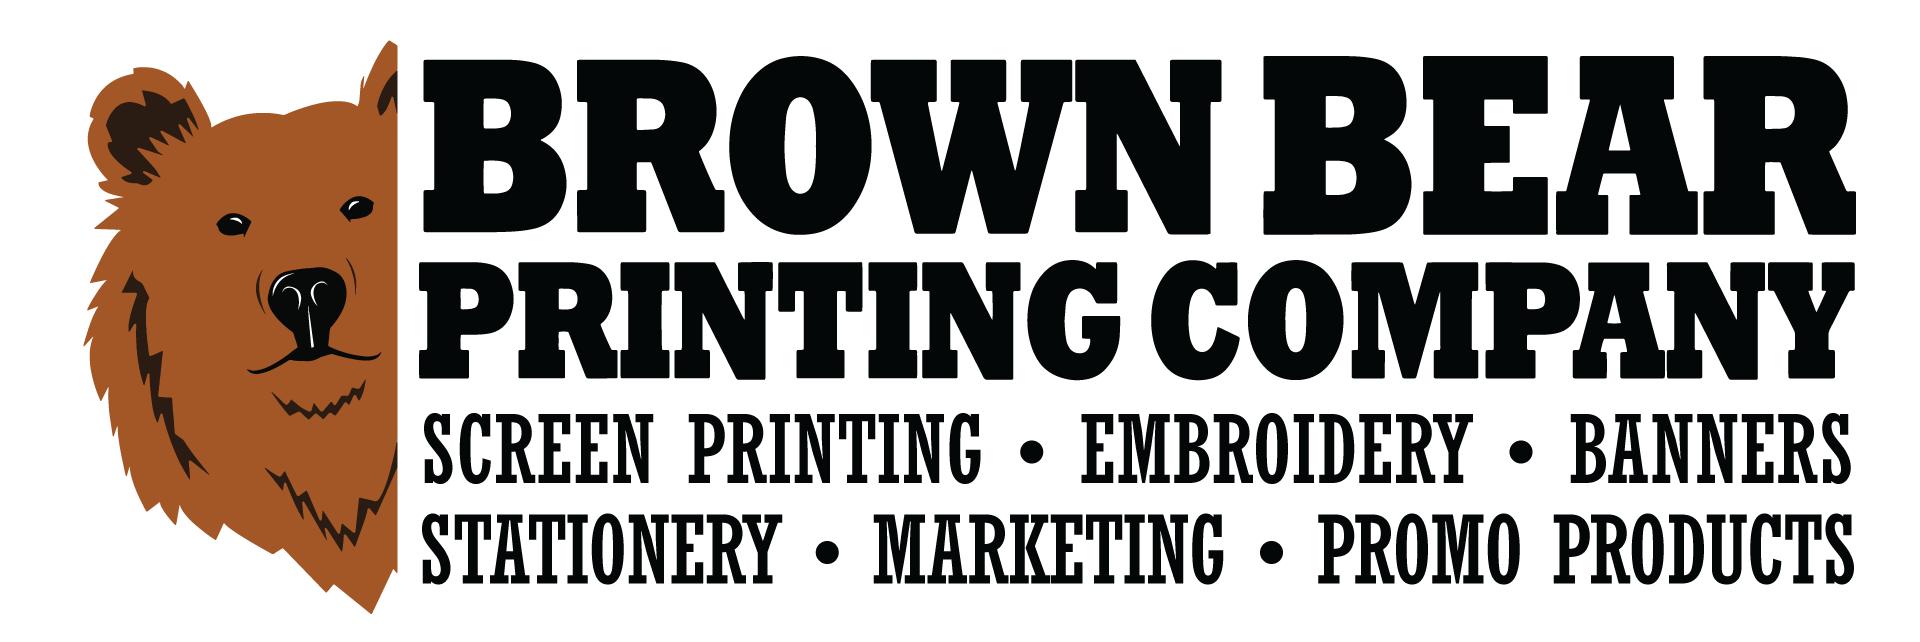 Brown Bear Printing